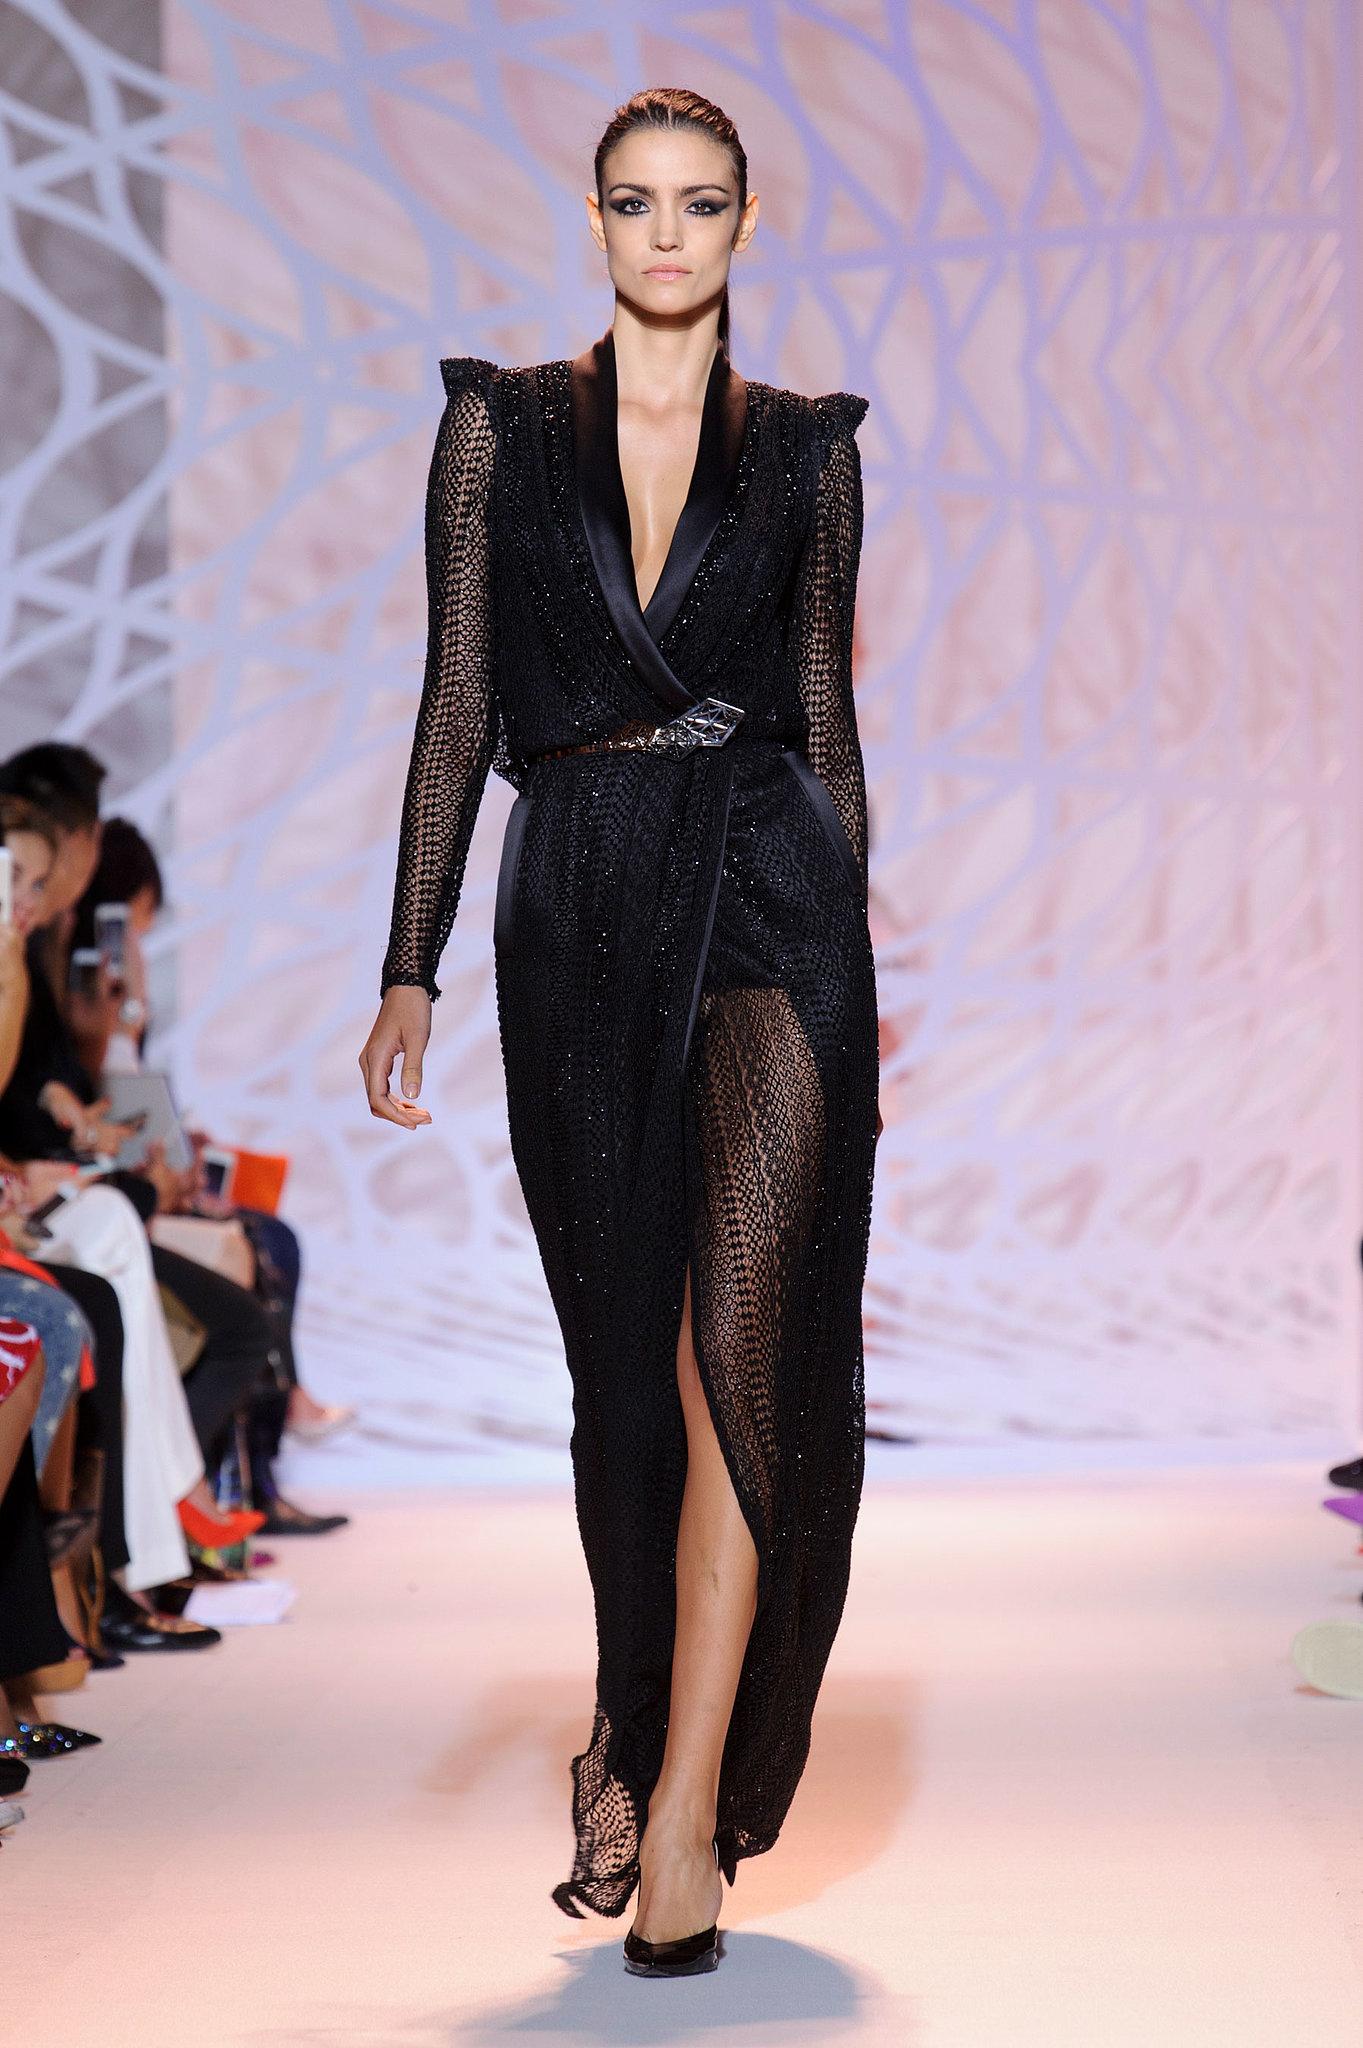 Zuhair-Murad-Haute-Couture-Fall-2014 (3)